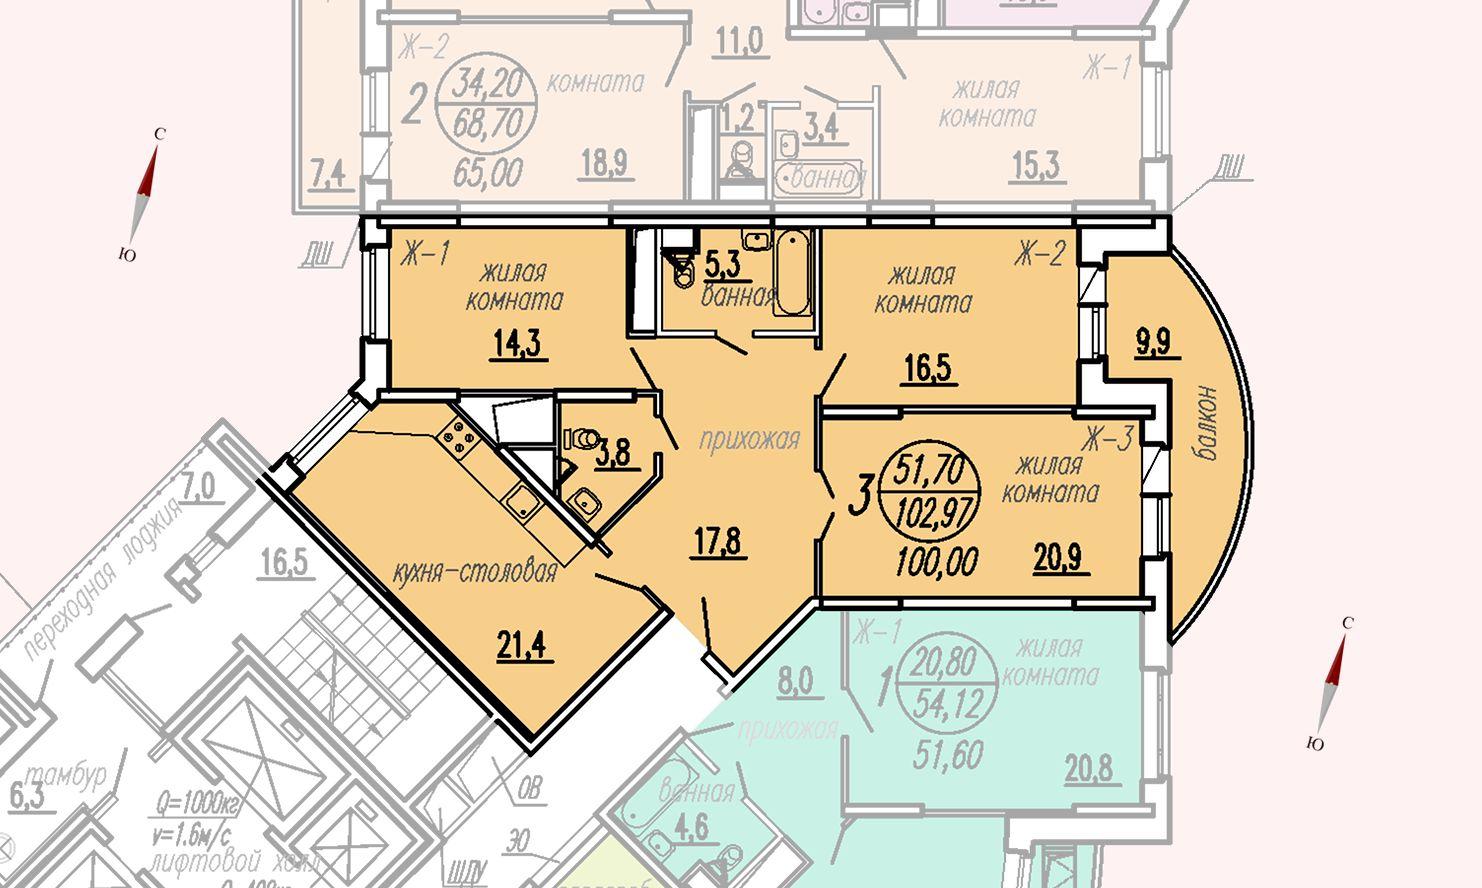 ул. Дирижабельная, д. 1, секция3, квартира 102,97 м2